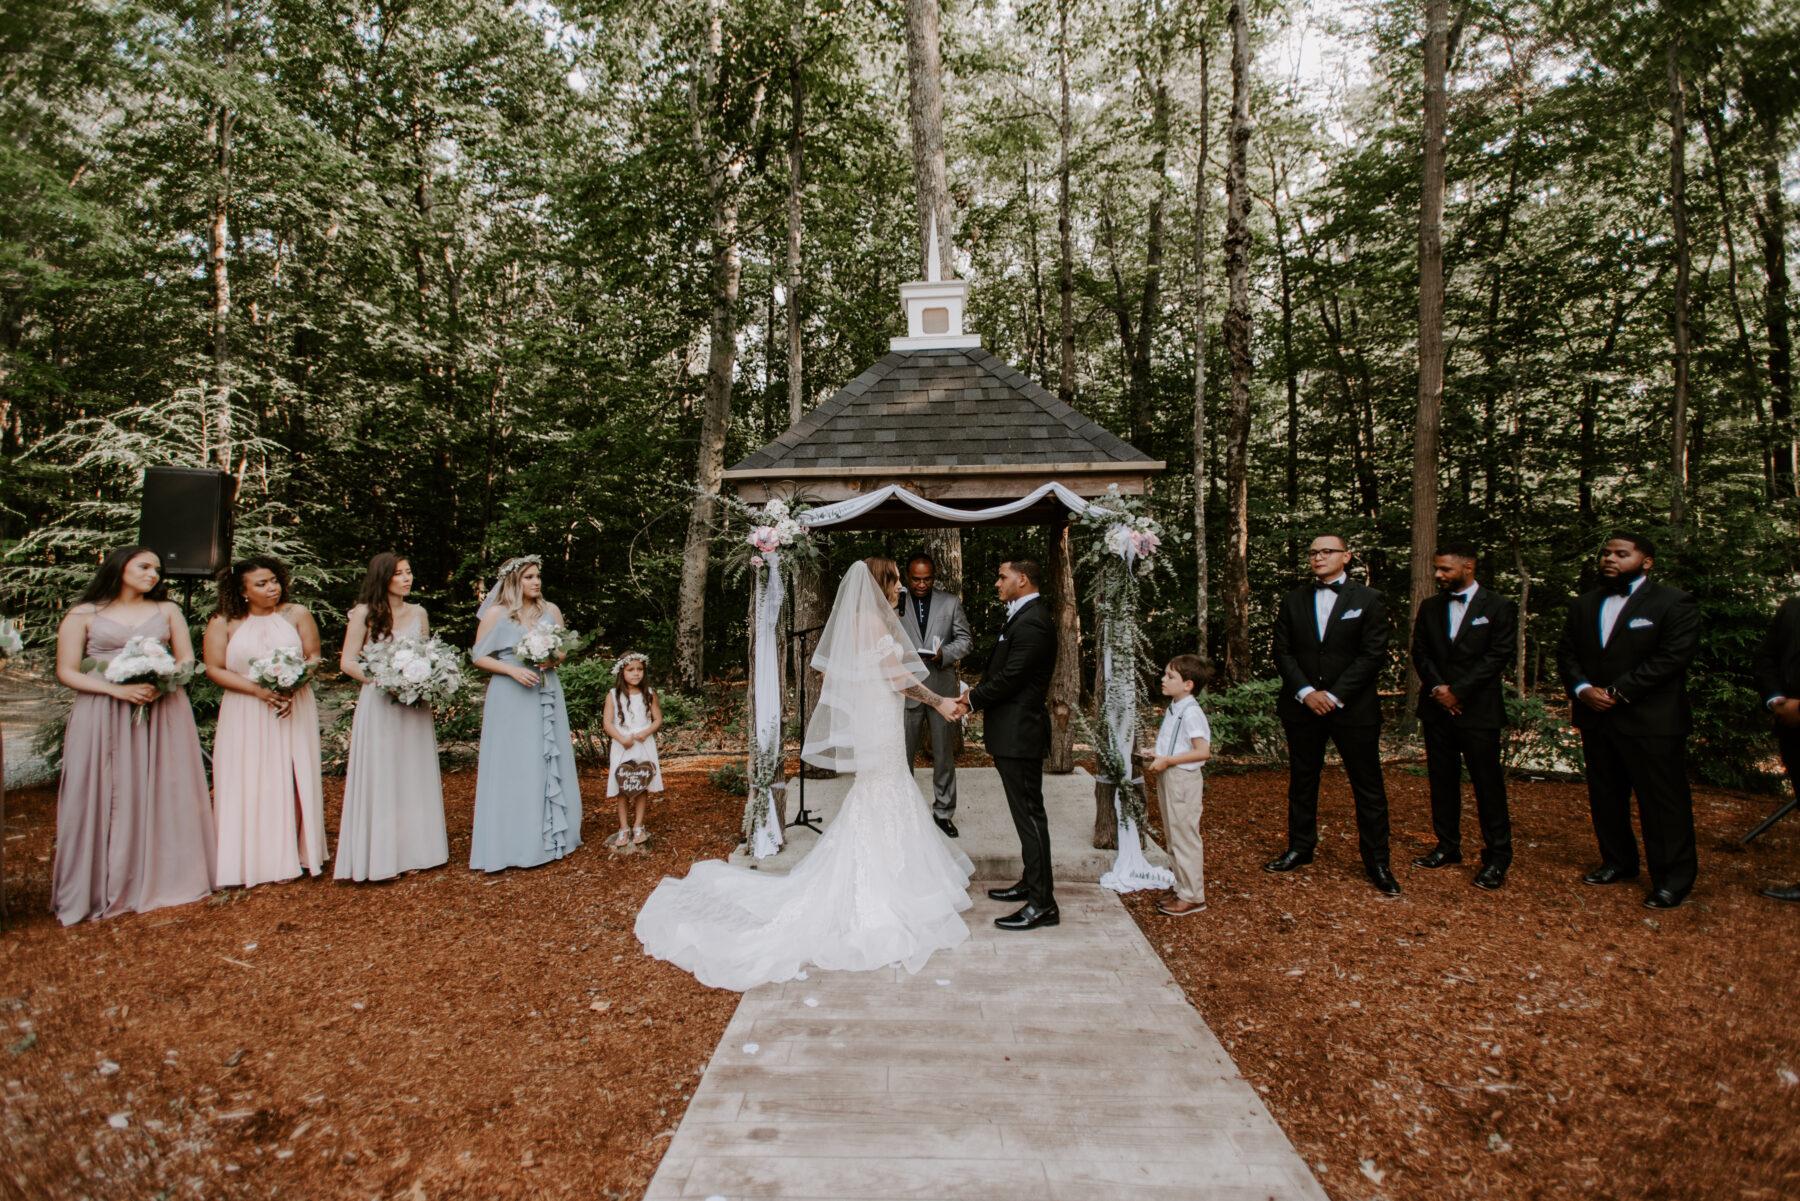 Five Bridge Inn Rehoboth Wedding Katie and Enrique Blueflash Photography 19